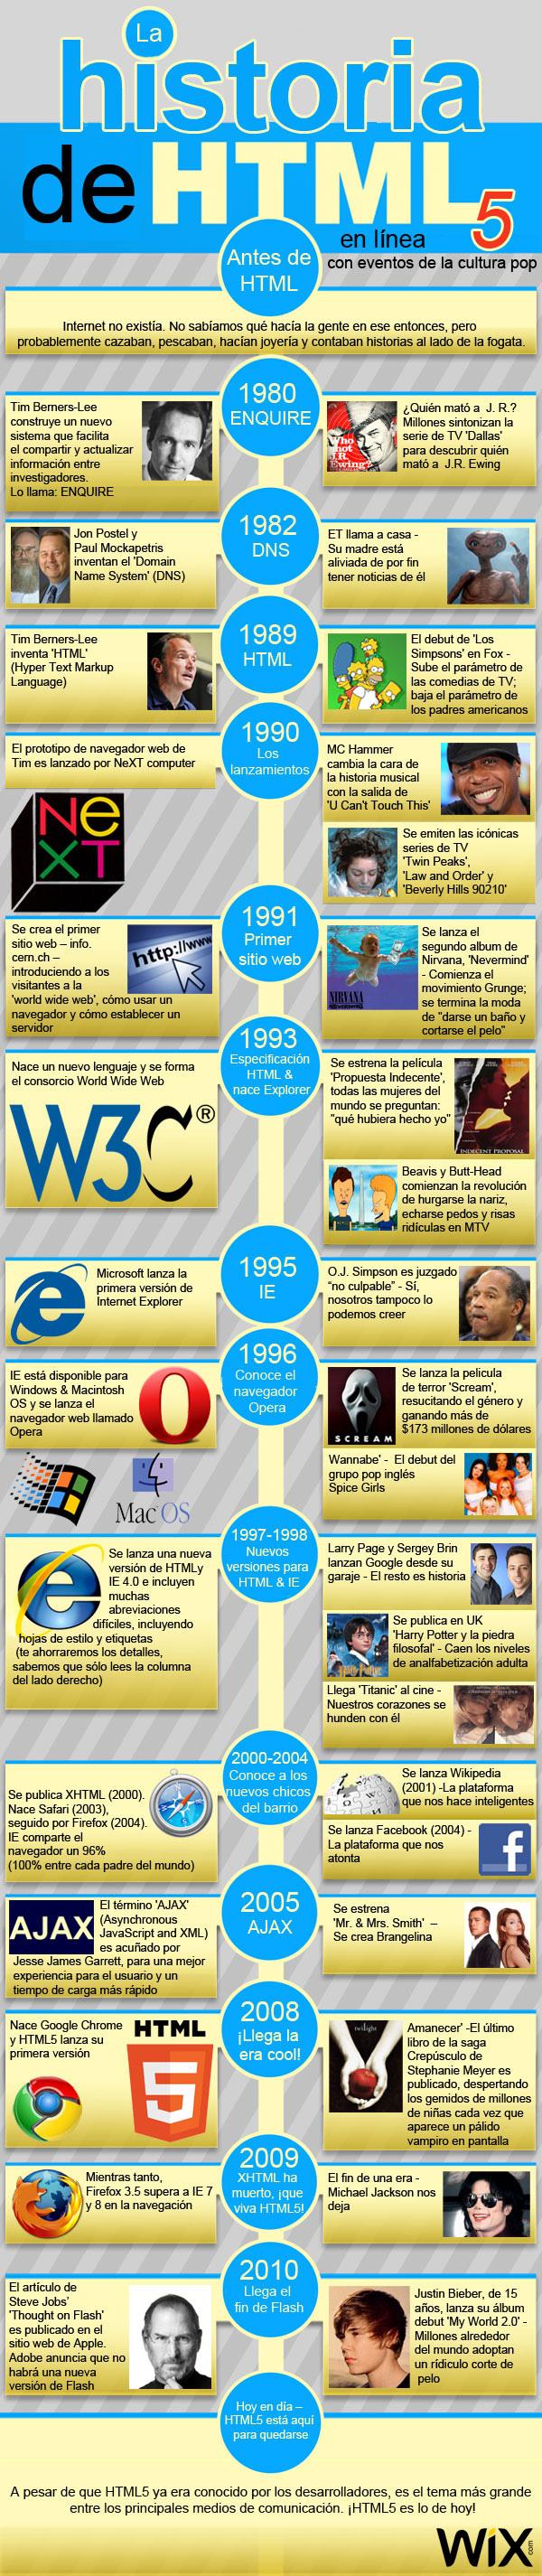 La Historia de HTML5